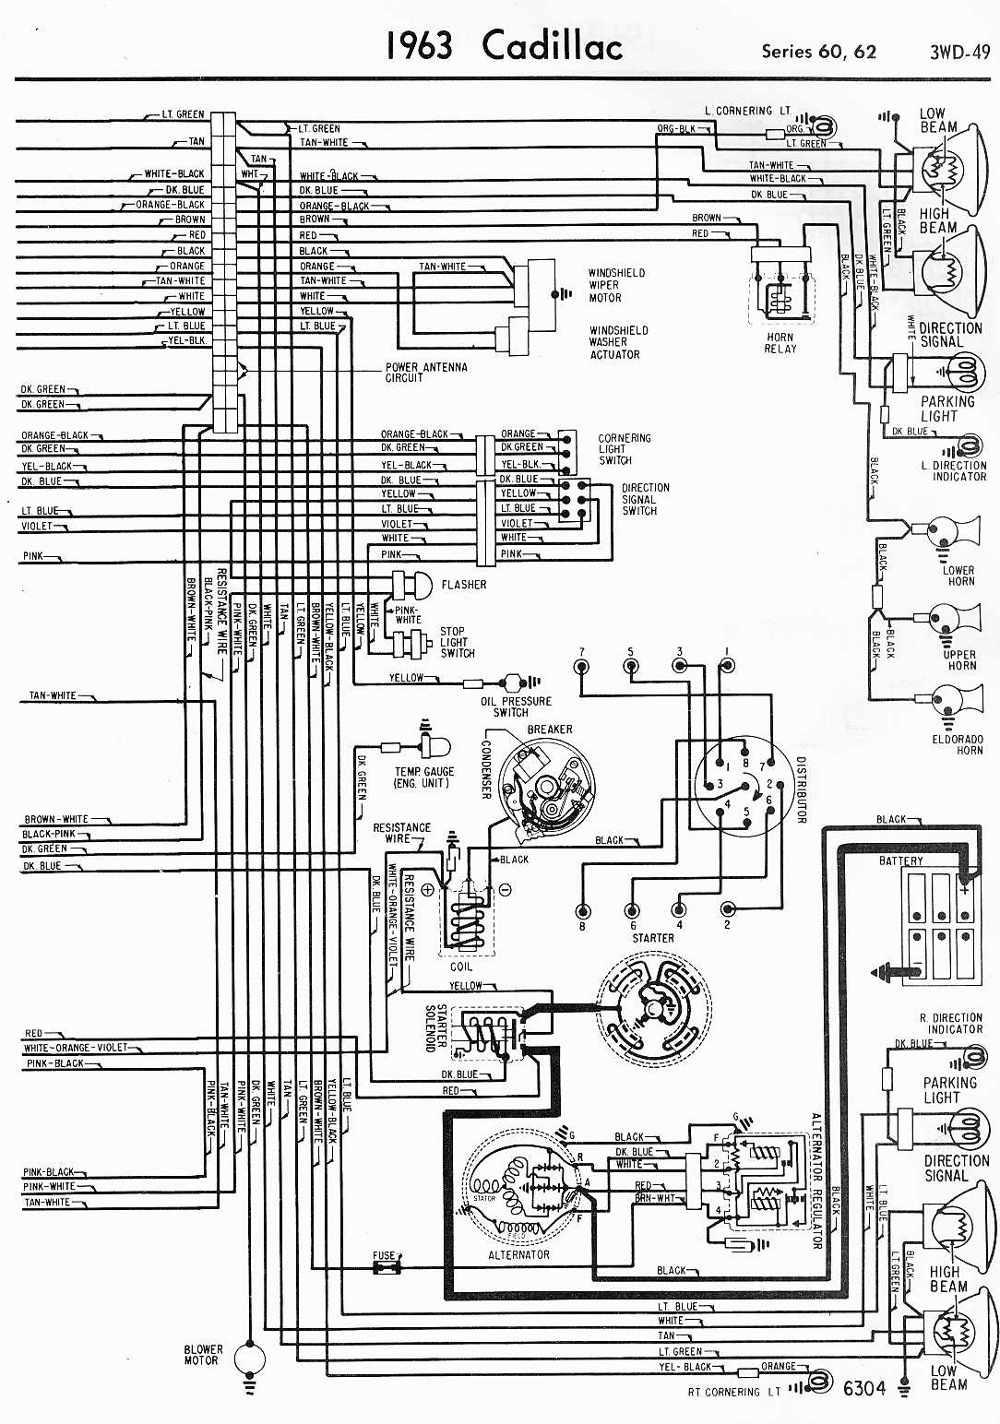 Wiring Bdiagrams Bschematics B Bcadillac Bseries B Band B Bpart B on 1951 Dodge Wiring Diagram